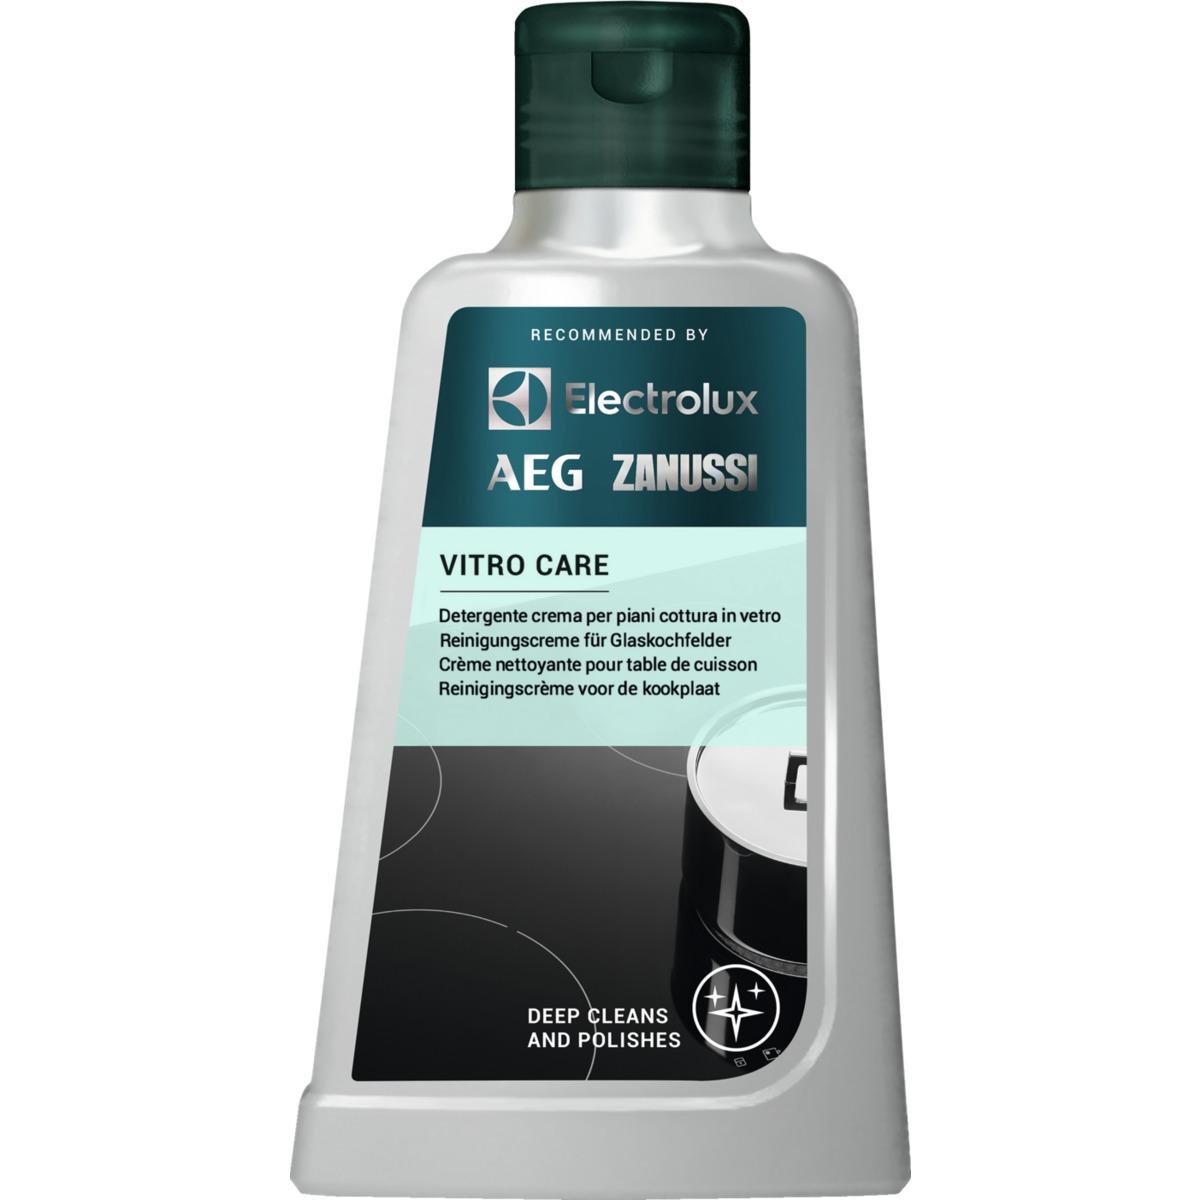 AEG vitro creme glazen kookpl.